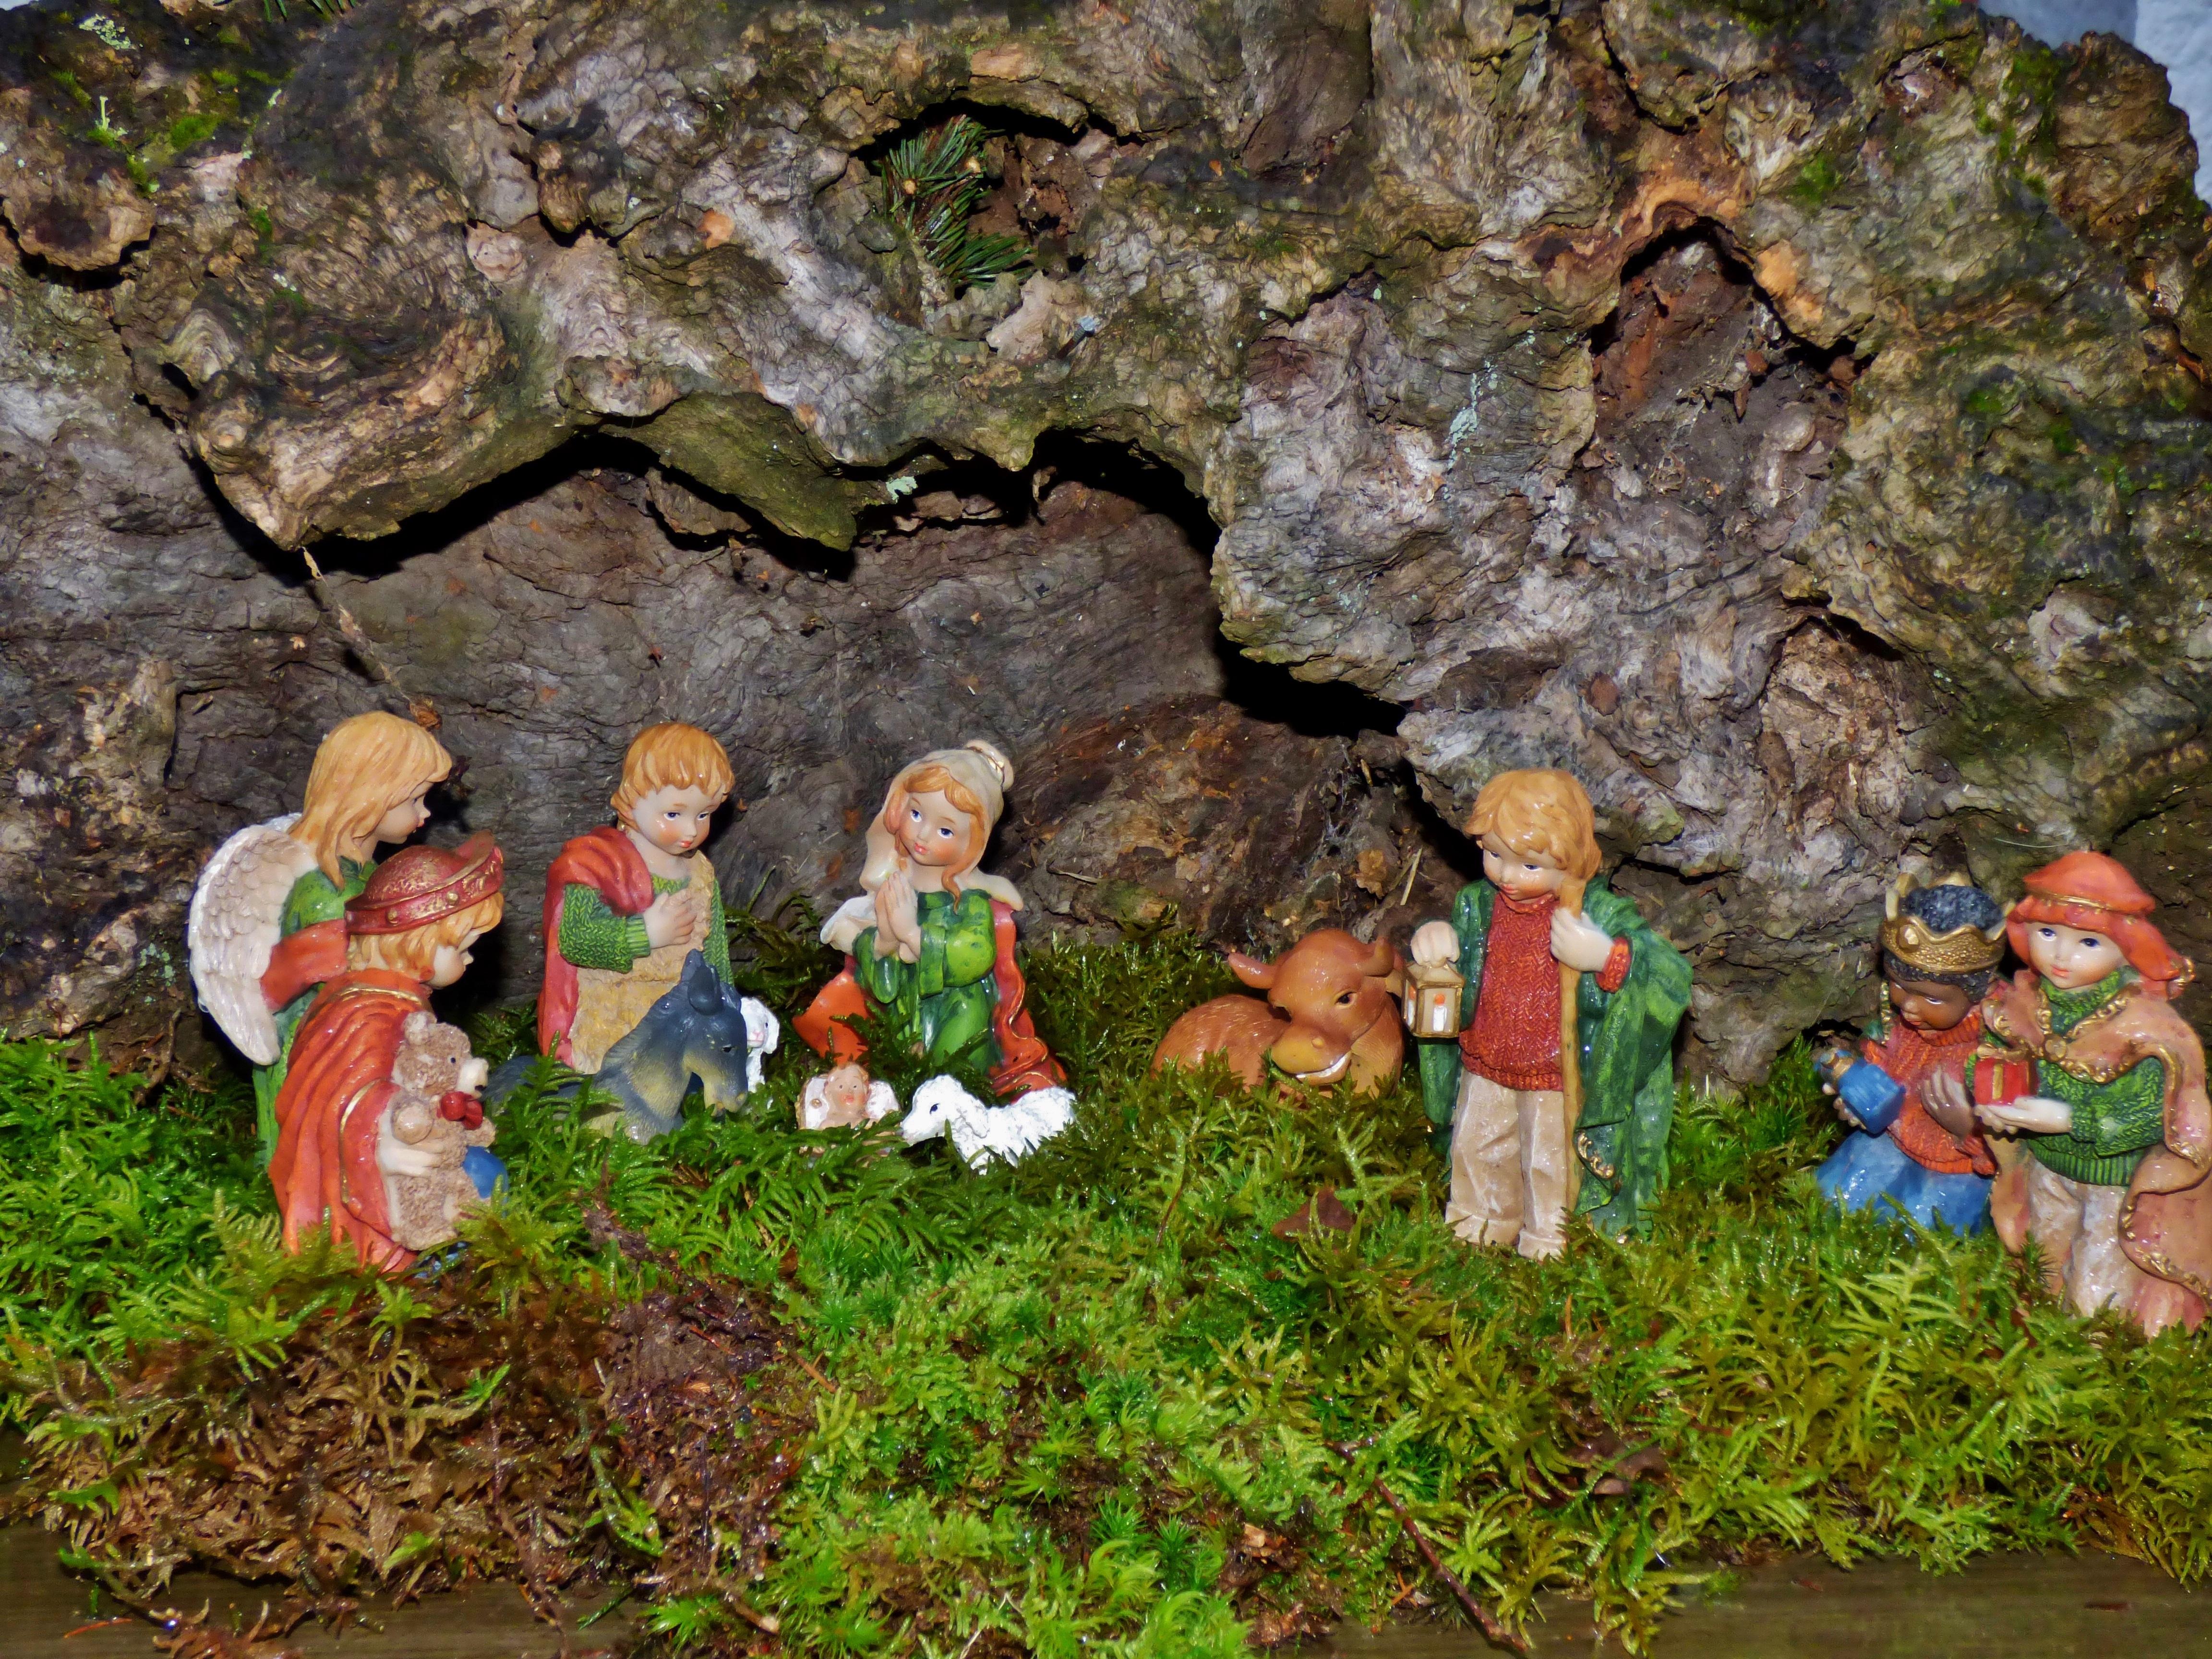 tree moss cave christmas decor christmas decoration jesus joseph manger nativity scene